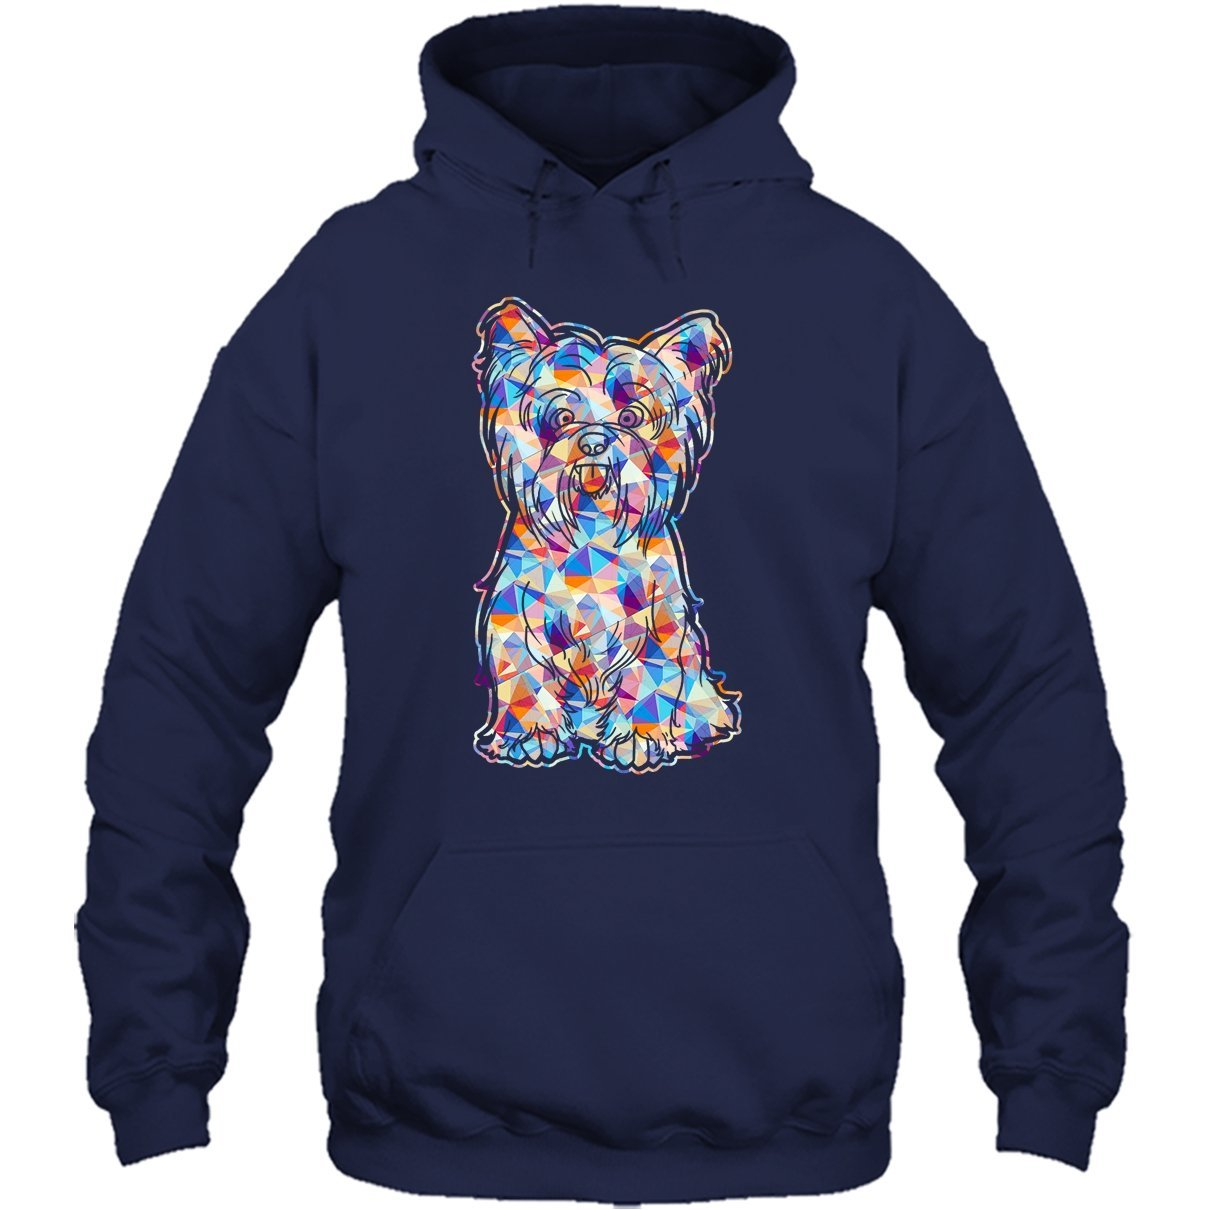 Yorkie Cool Tshirt Yorkie Geometric Colorful Tee Shirt Design for Men and Women